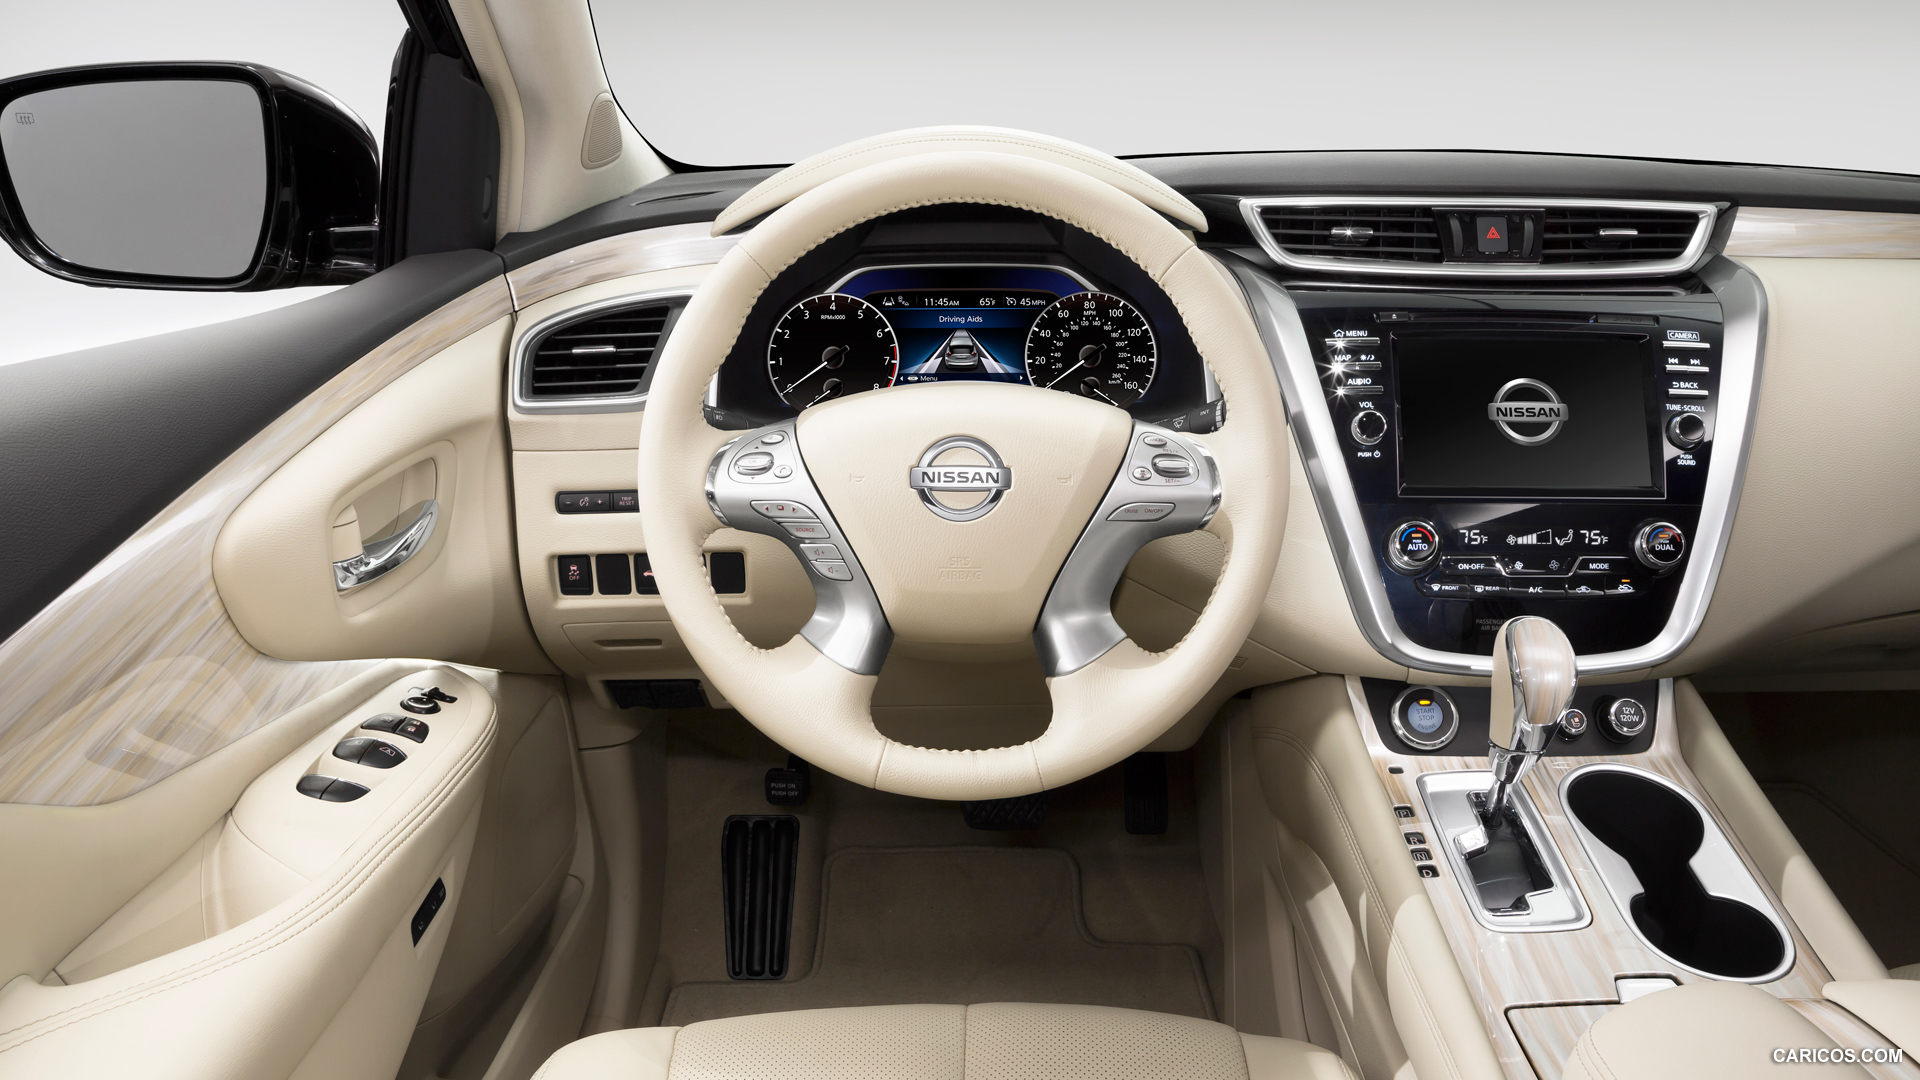 2015 Nissan Murano   Interior HD Wallpaper 13 1920x1080